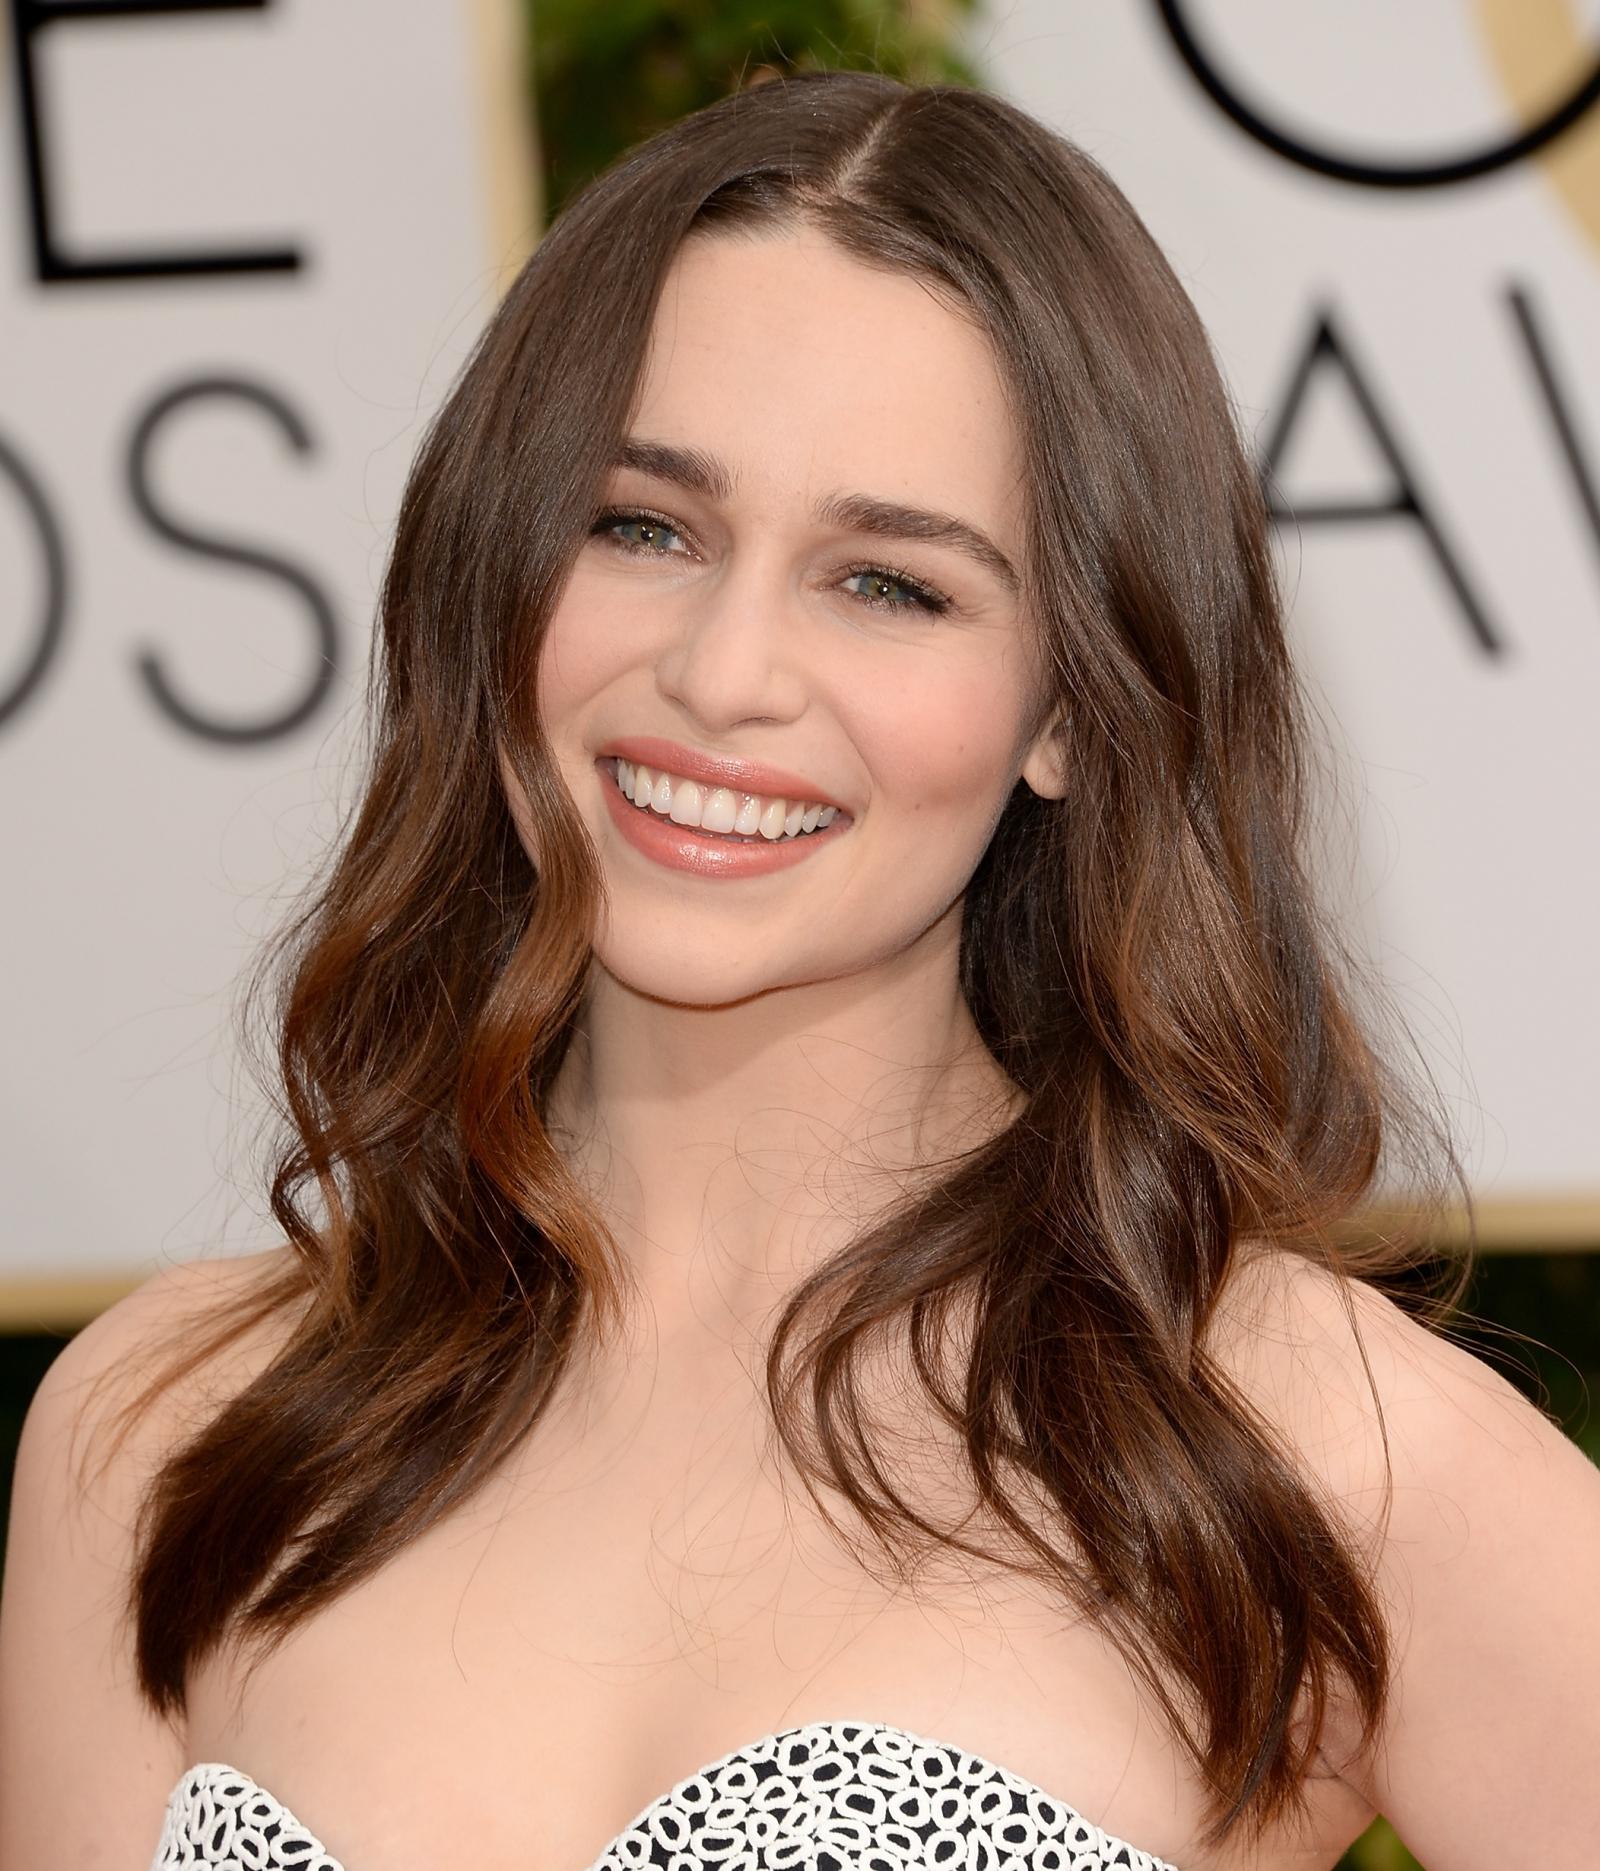 image Emilia clarke getting rammed hard